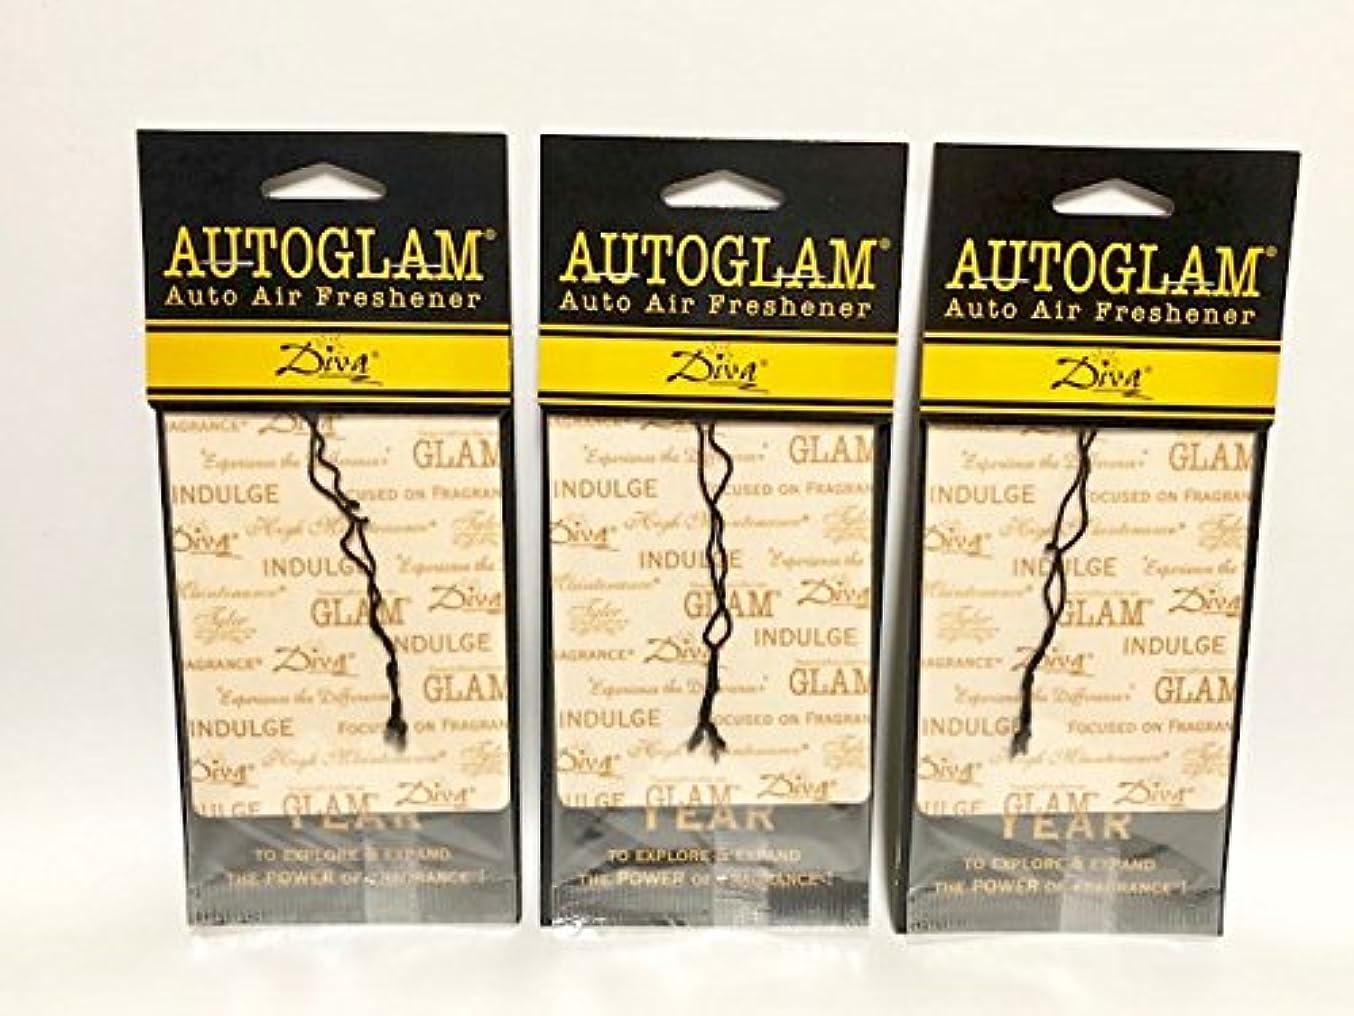 Tyler Candles Autoglam Auto Air Freshener, Diva, Set of 3